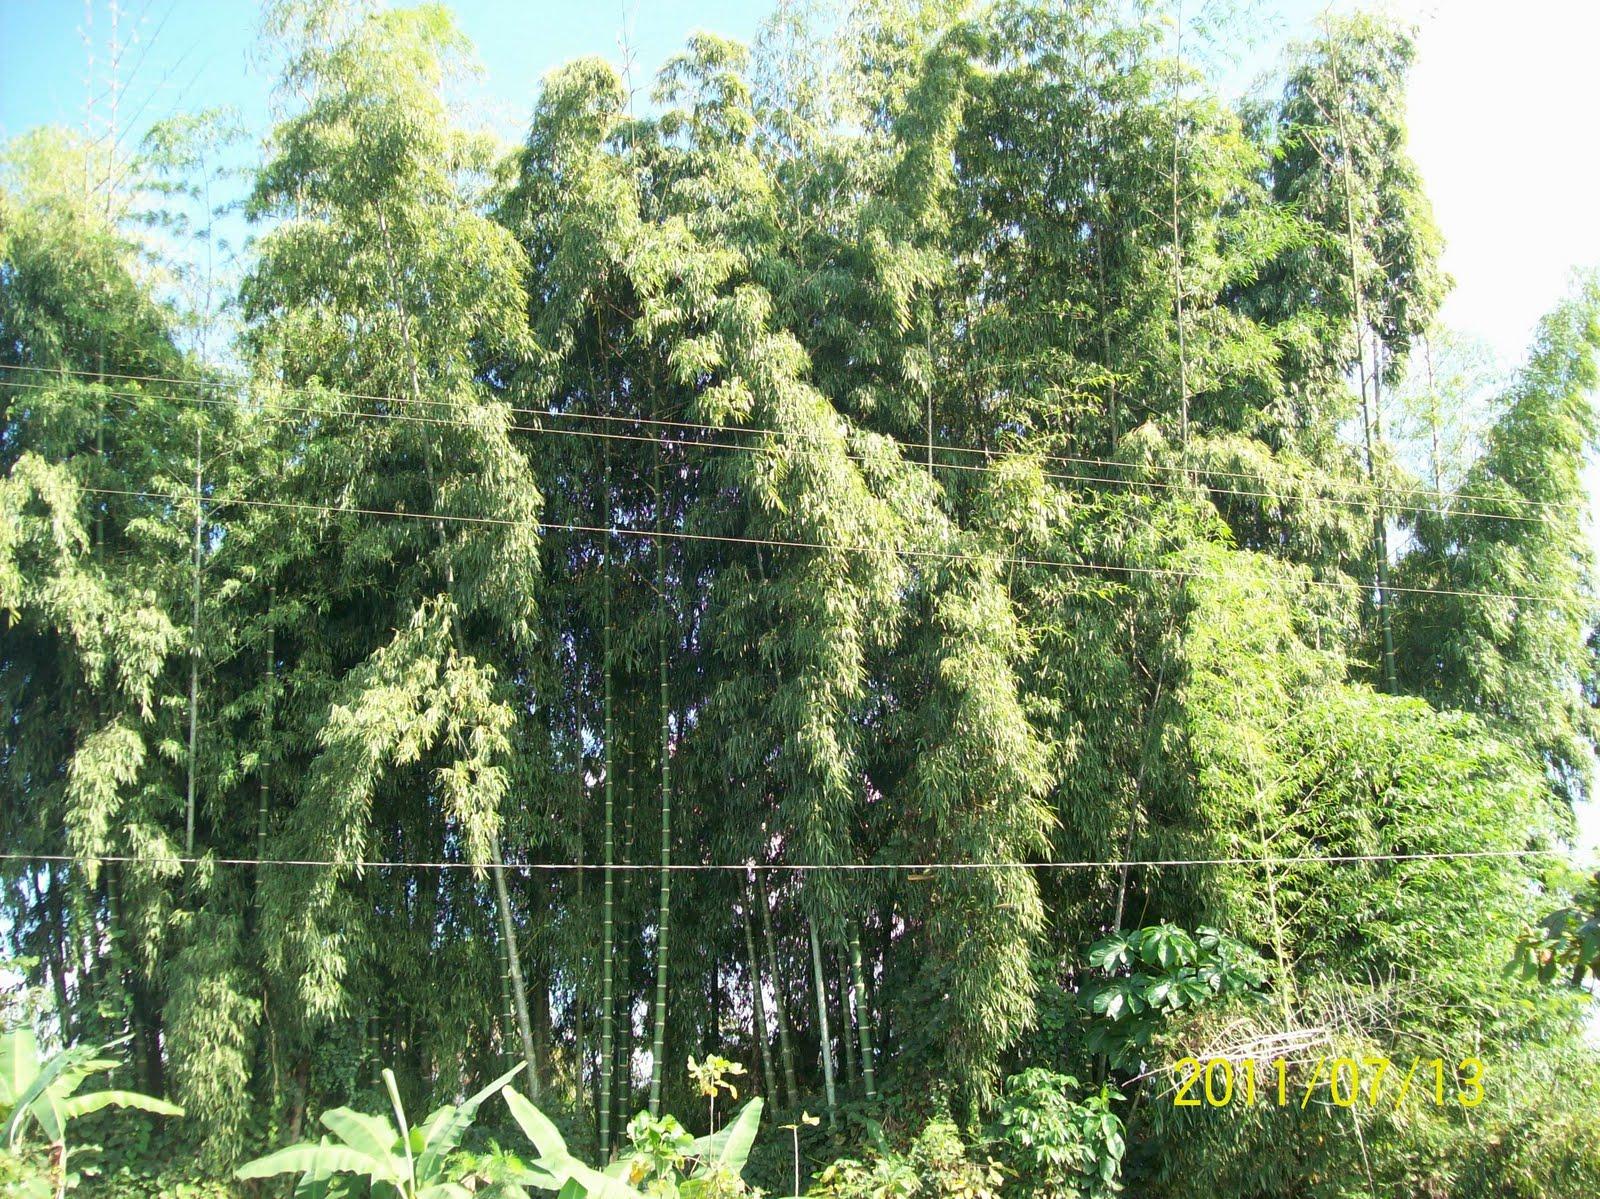 Agroper taller cultivo del bambu en aucayacu huanuco - Cultivo del bambu ...